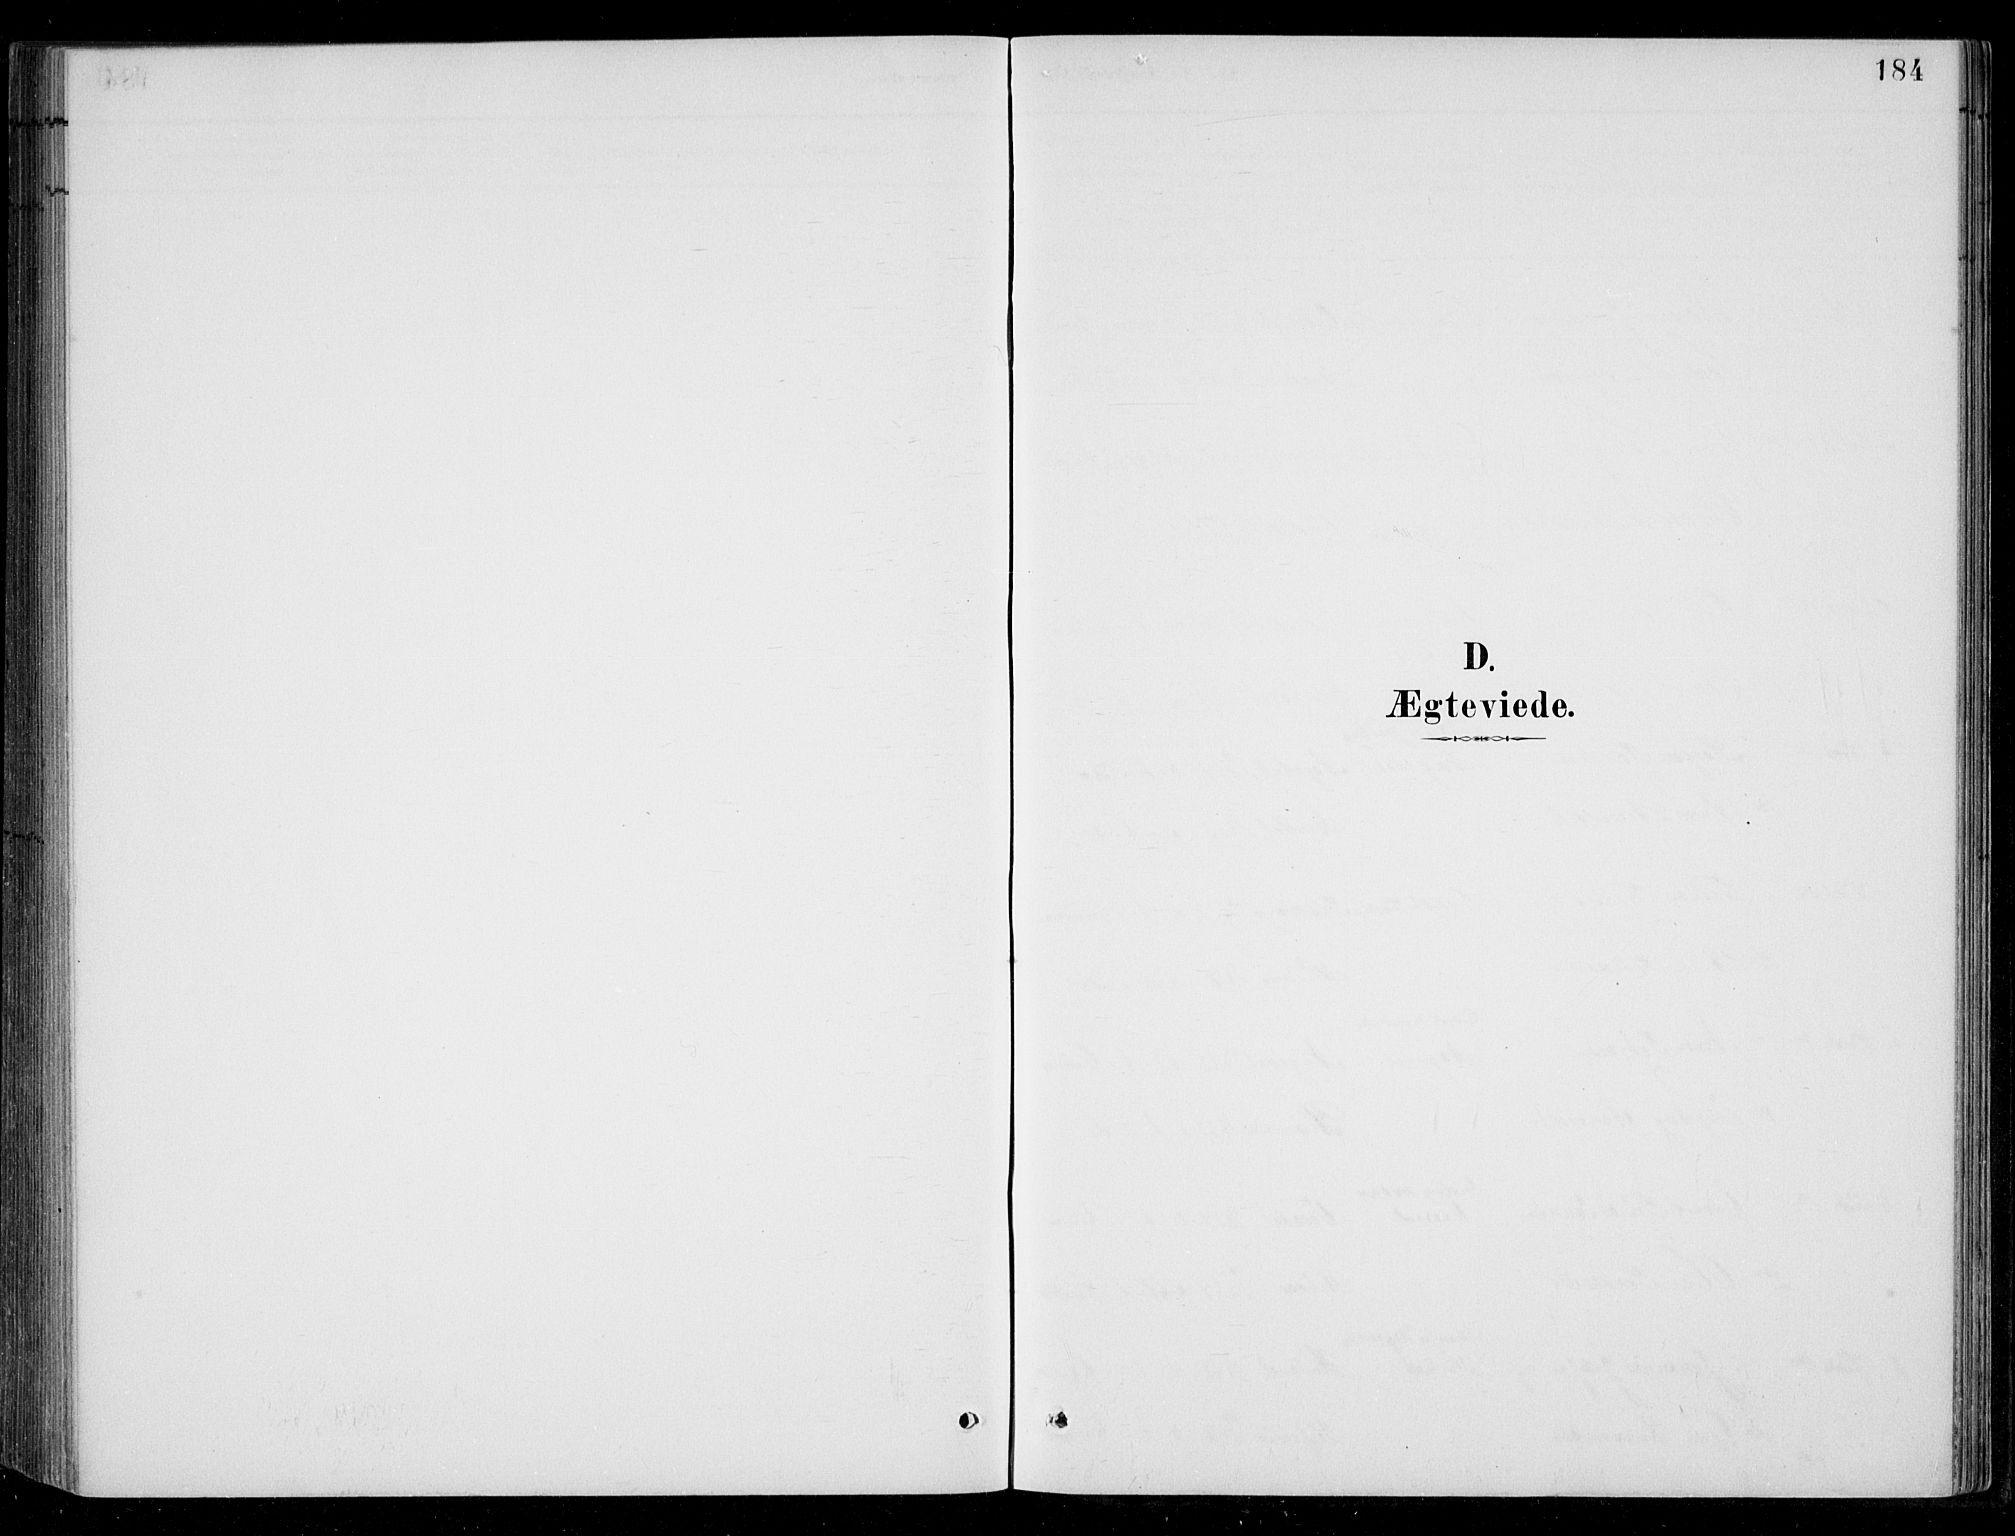 SAK, Bjelland sokneprestkontor, F/Fb/Fbc/L0003: Klokkerbok nr. B 3, 1887-1924, s. 184